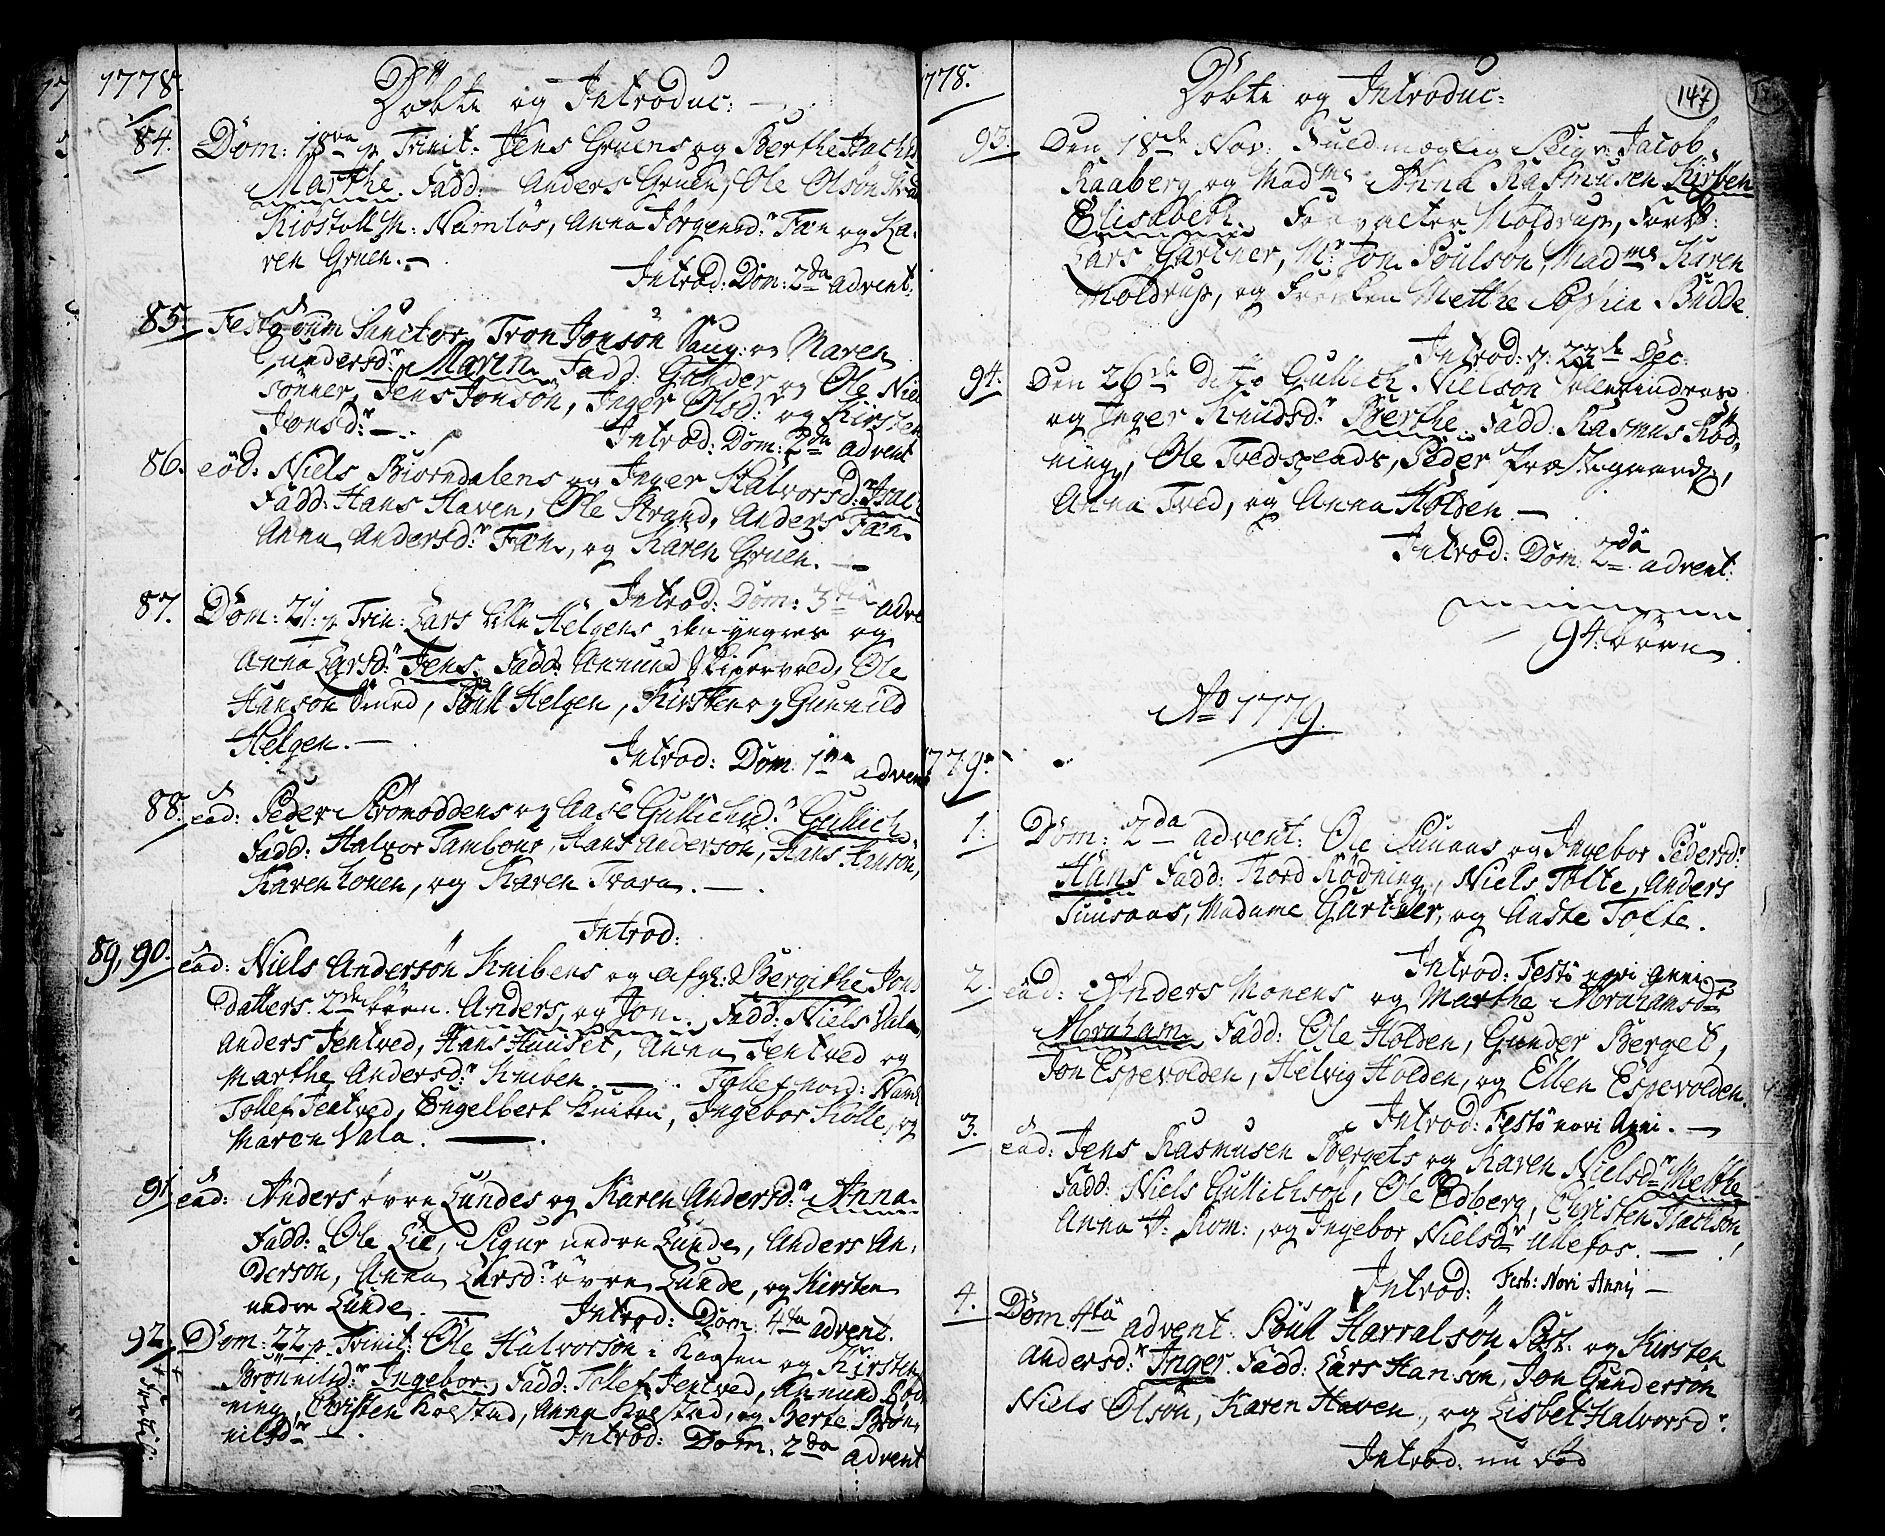 SAKO, Holla kirkebøker, F/Fa/L0001: Ministerialbok nr. 1, 1717-1779, s. 147